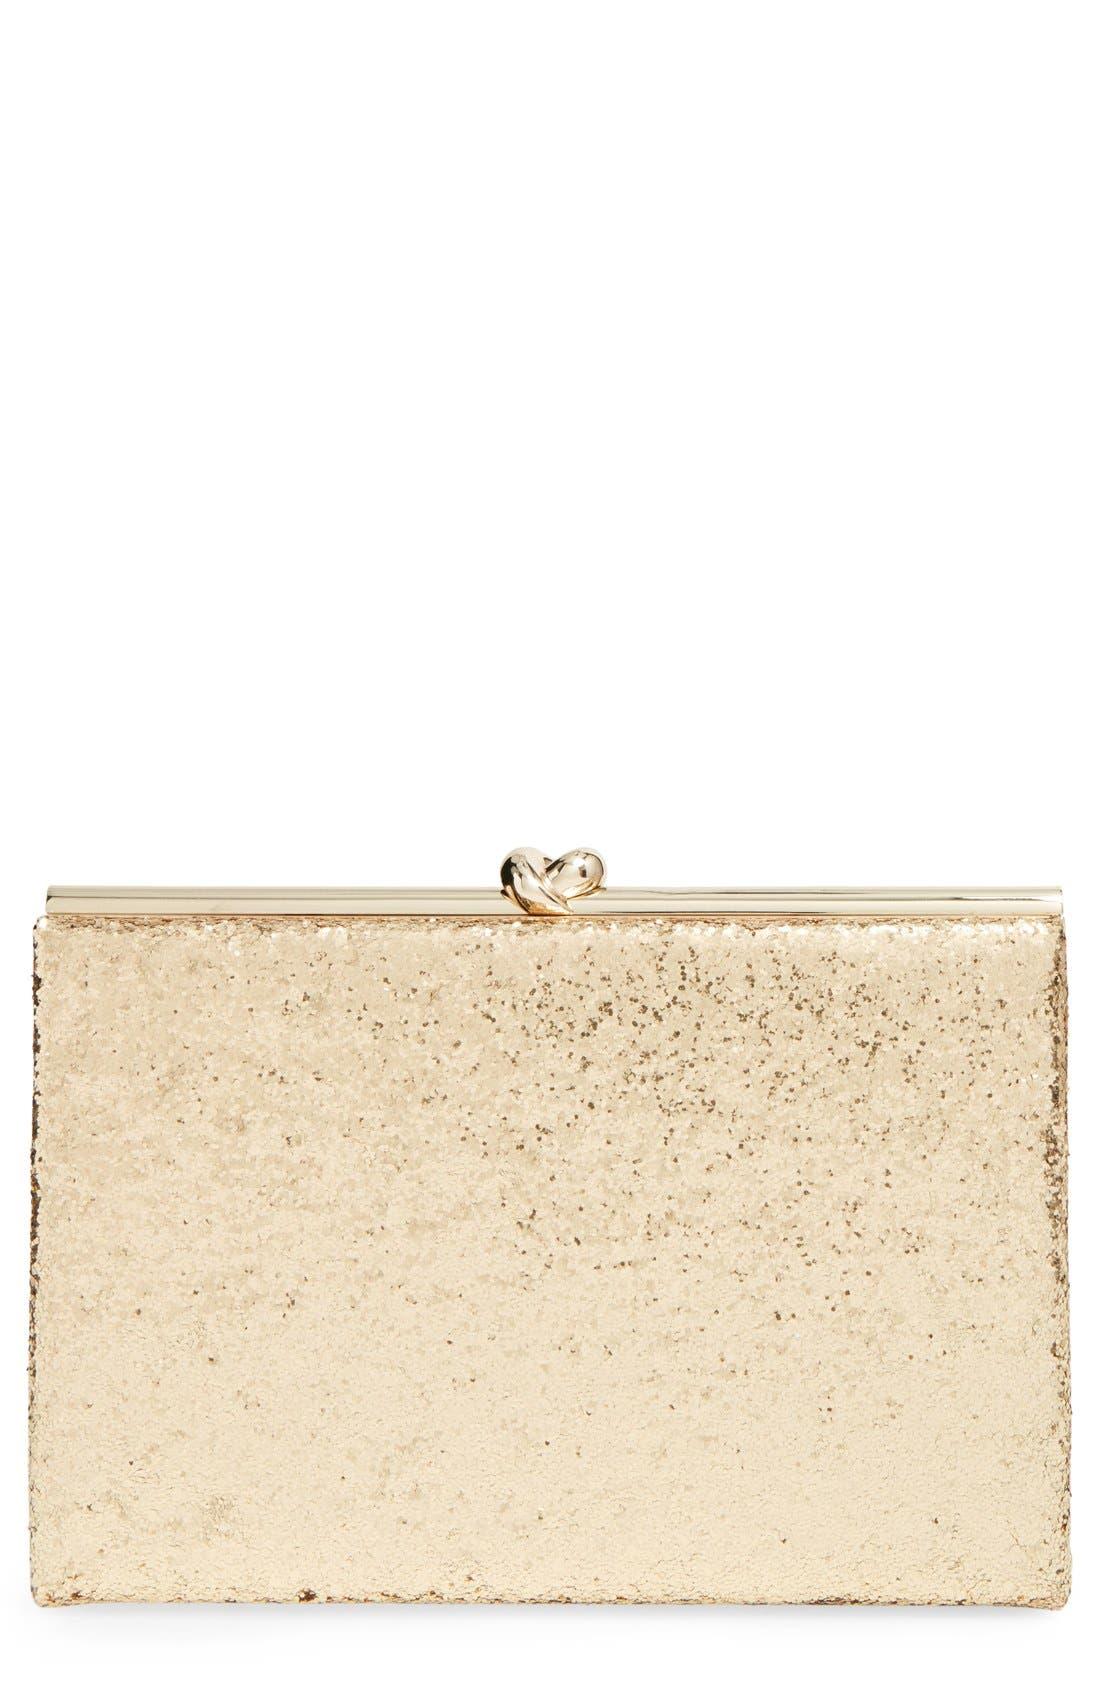 Main Image - kate spade new york 'wedding belles - gold knot' glitter box clutch